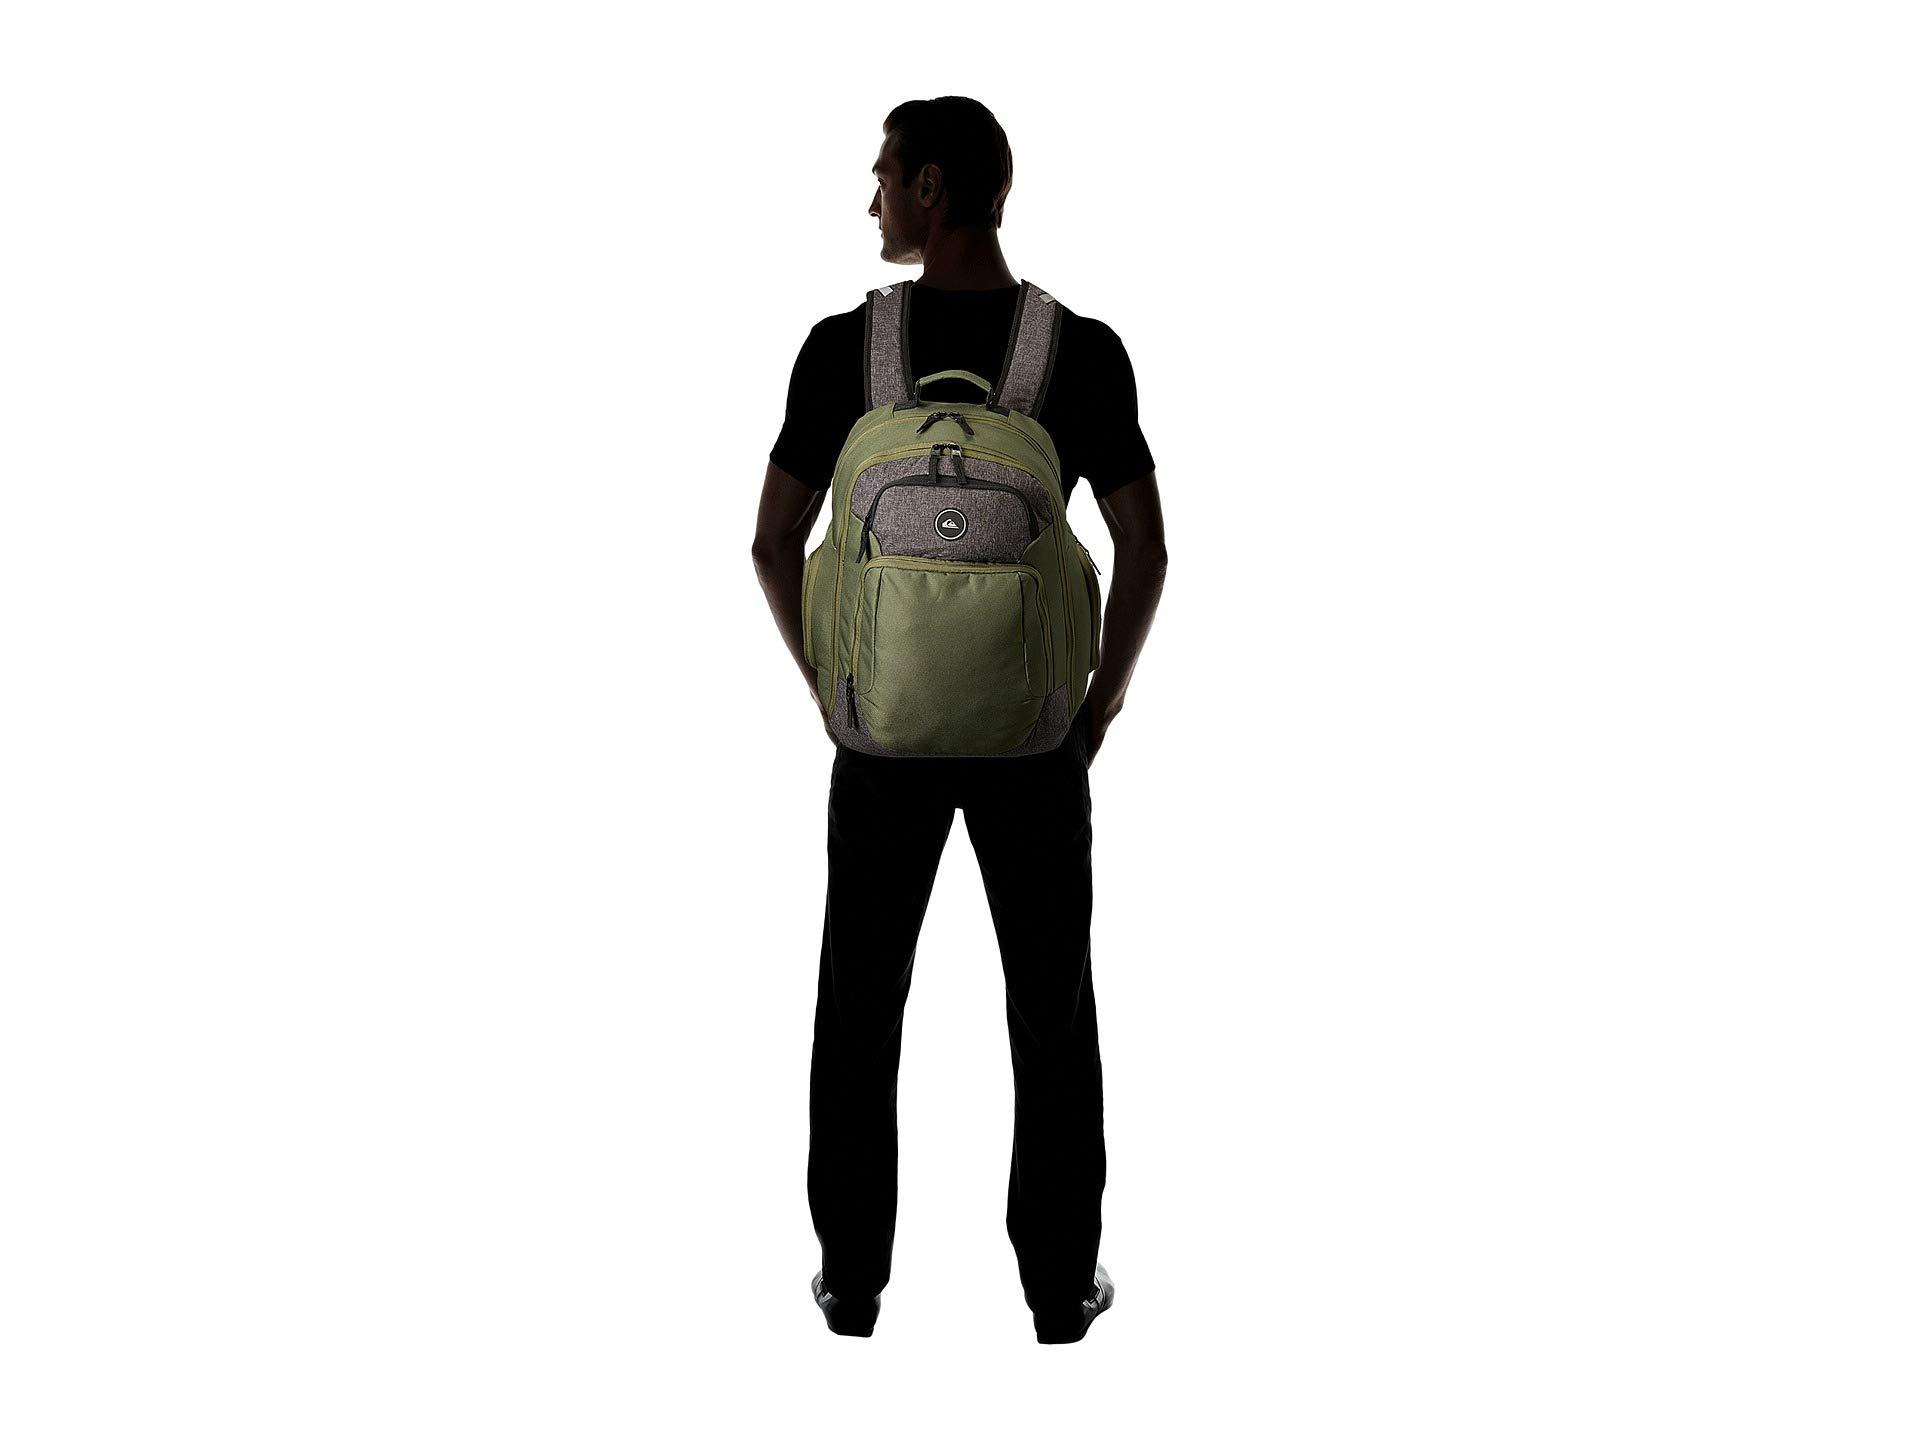 Quiksilver Quiksilver Shutter Thyme Backpack Backpack Shutter Quiksilver Thyme Quiksilver Shutter Backpack Backpack Thyme Shutter rrvFq